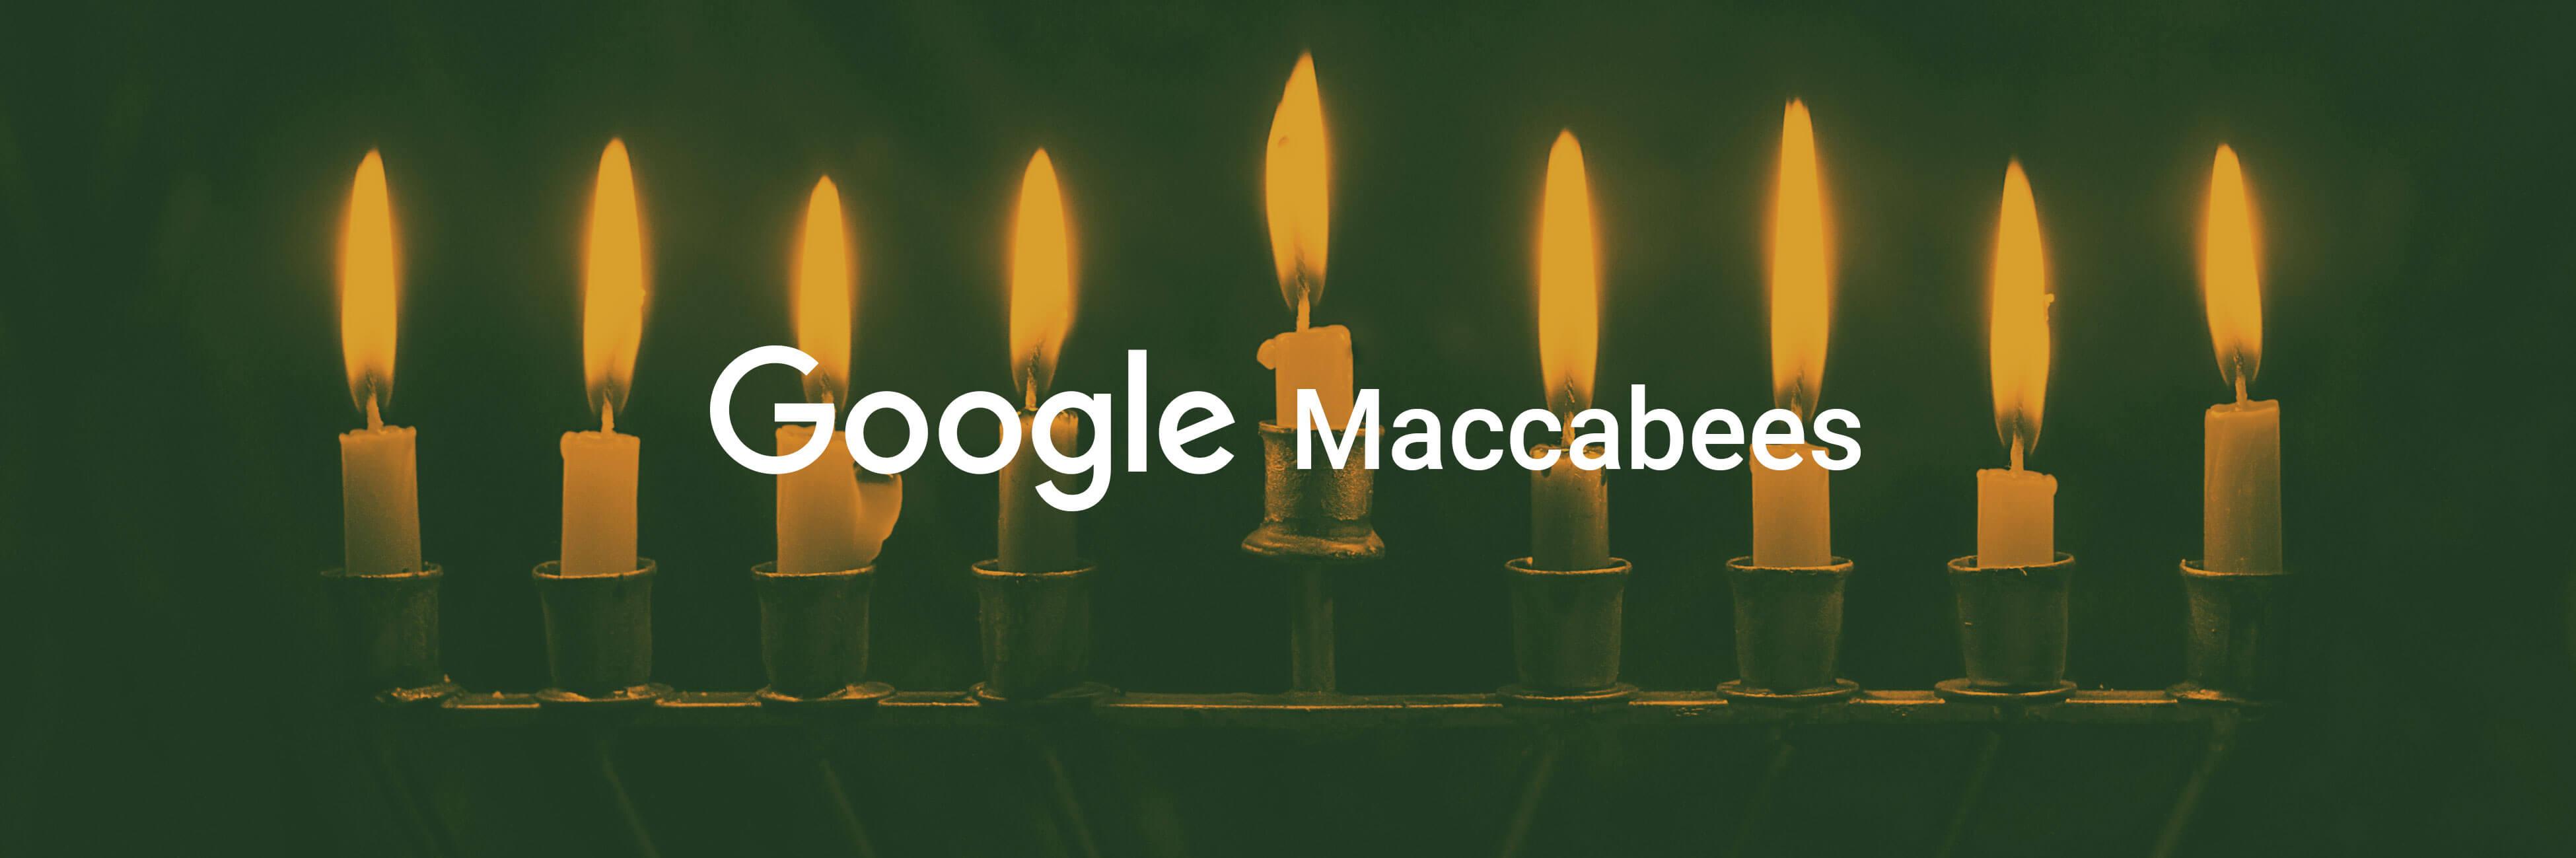 Google Maccabees 01